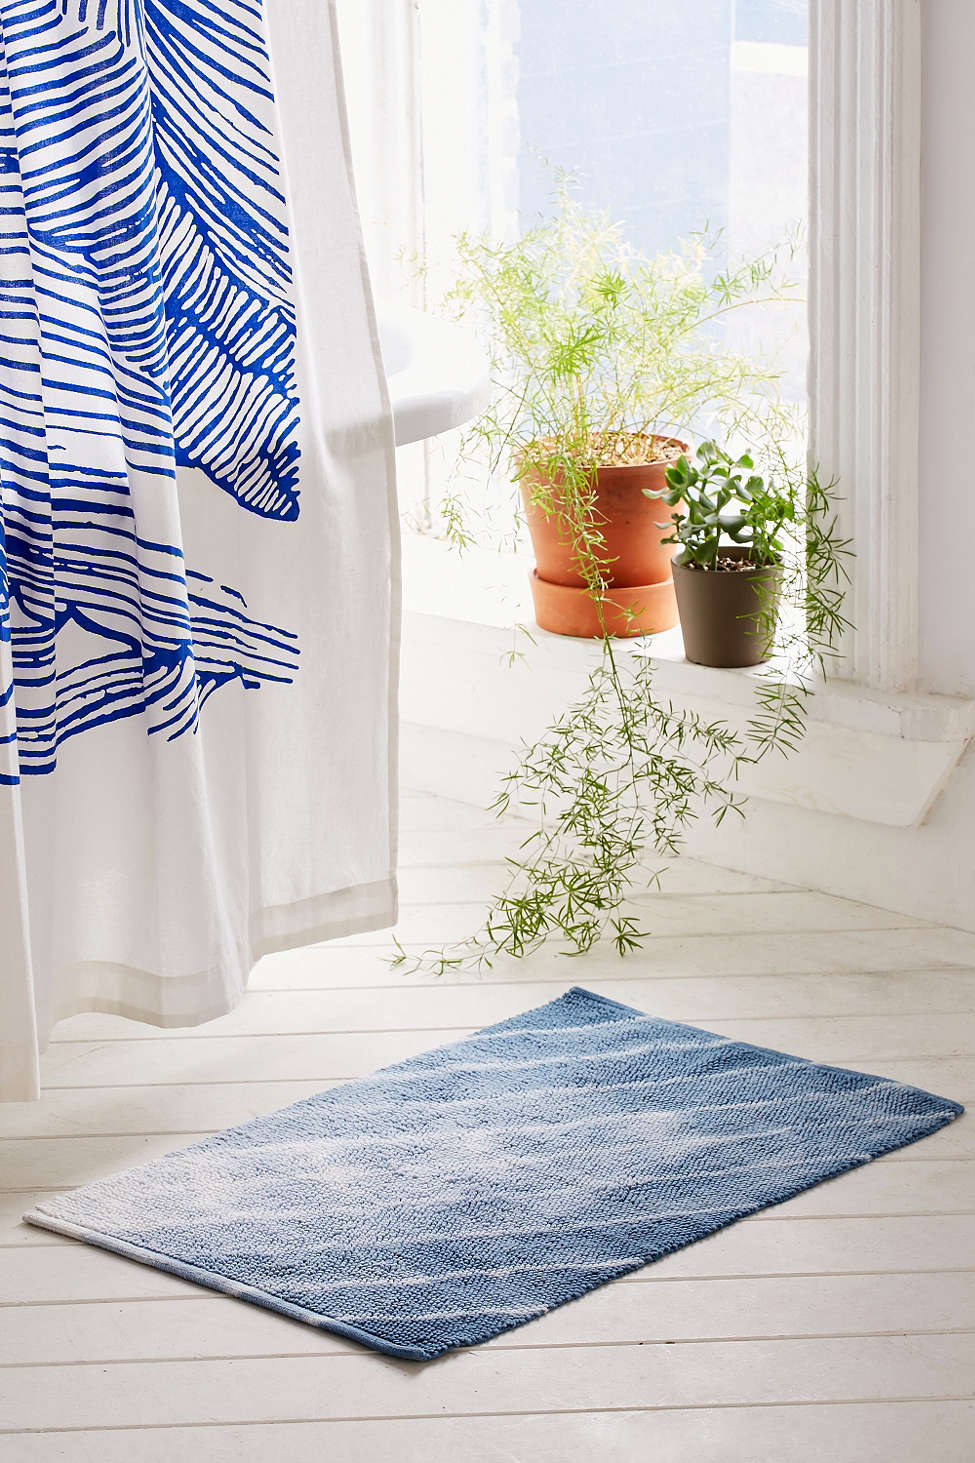 Shibori bath mat from Urban Outfitters